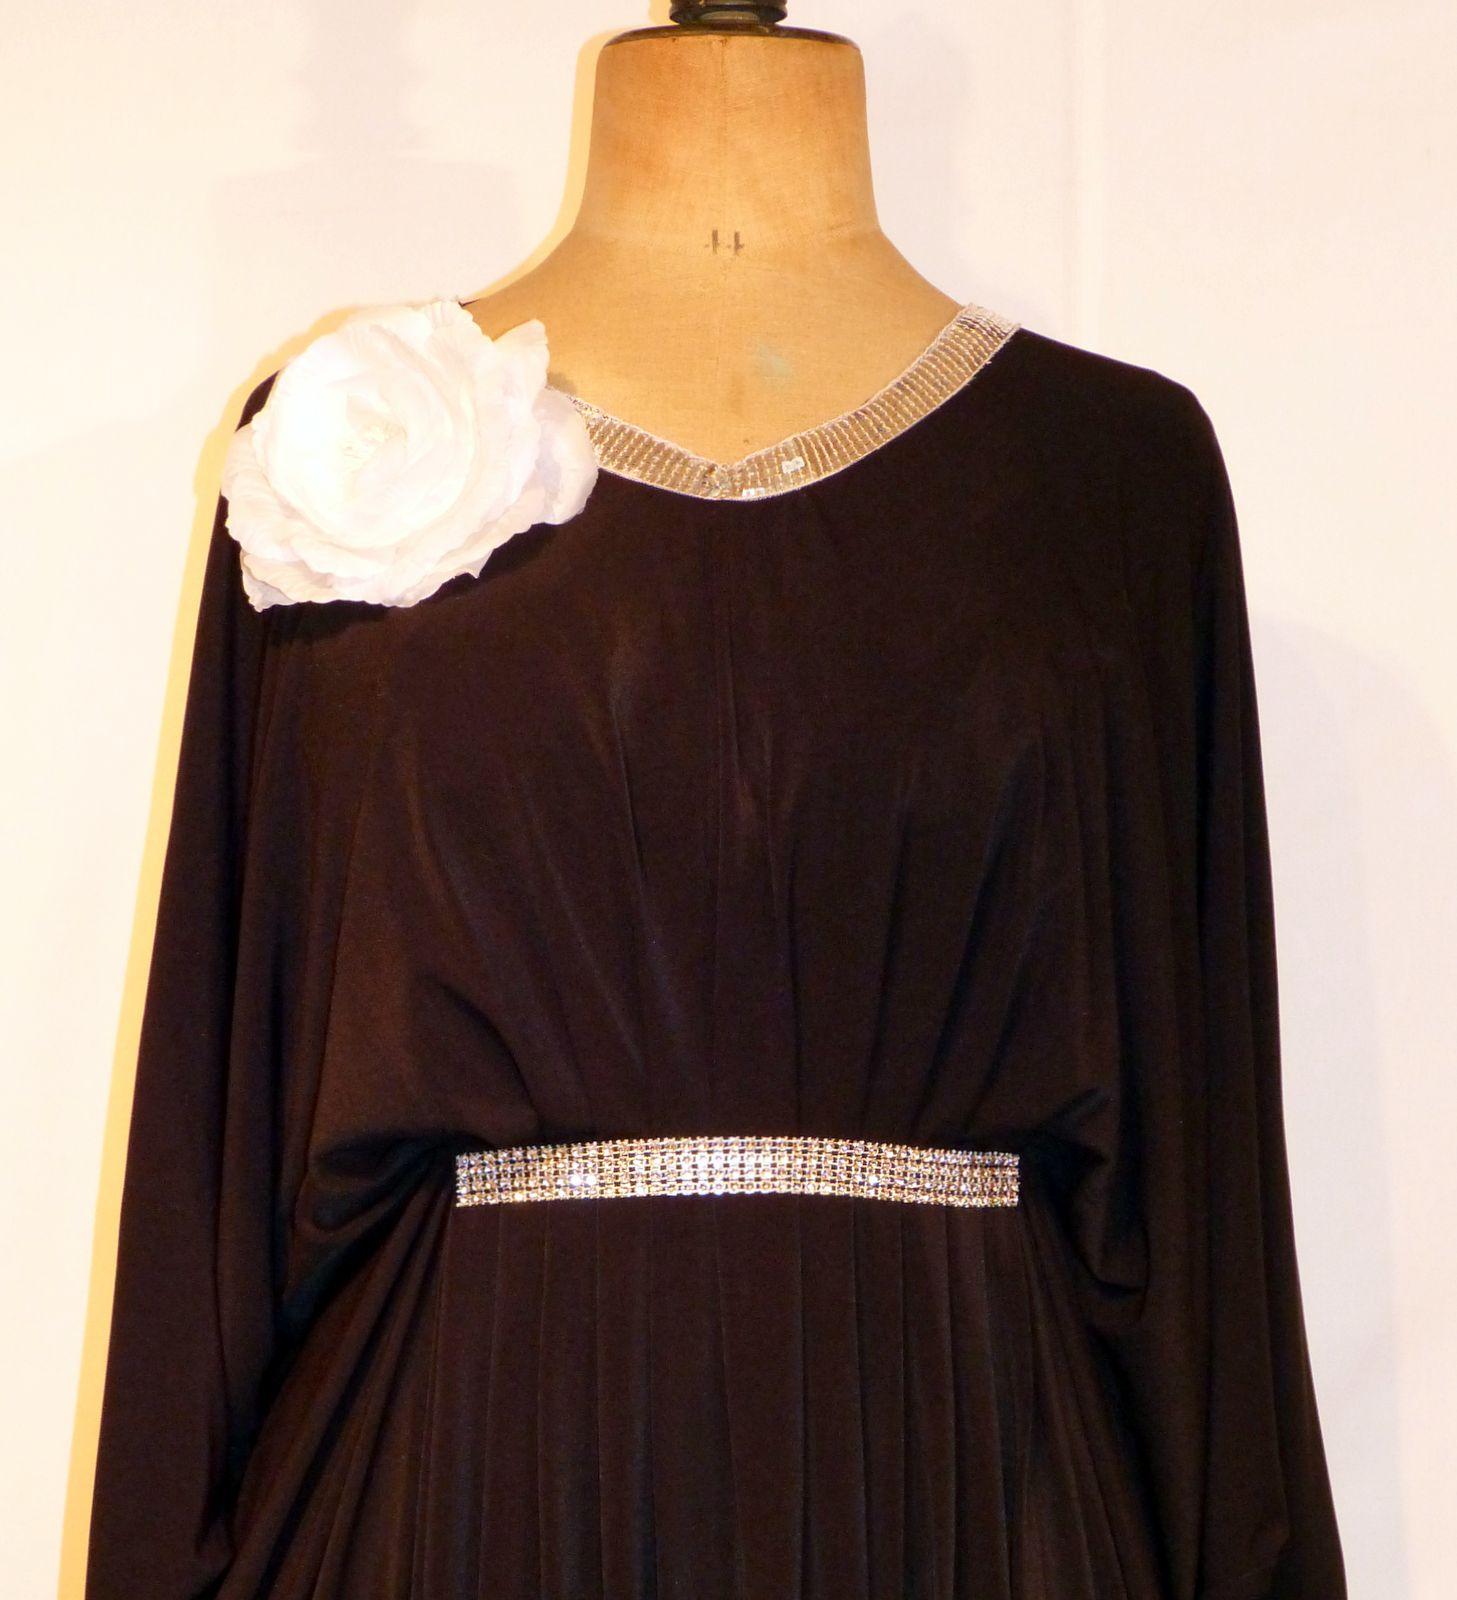 location de robe grande taille iris noir location robe. Black Bedroom Furniture Sets. Home Design Ideas